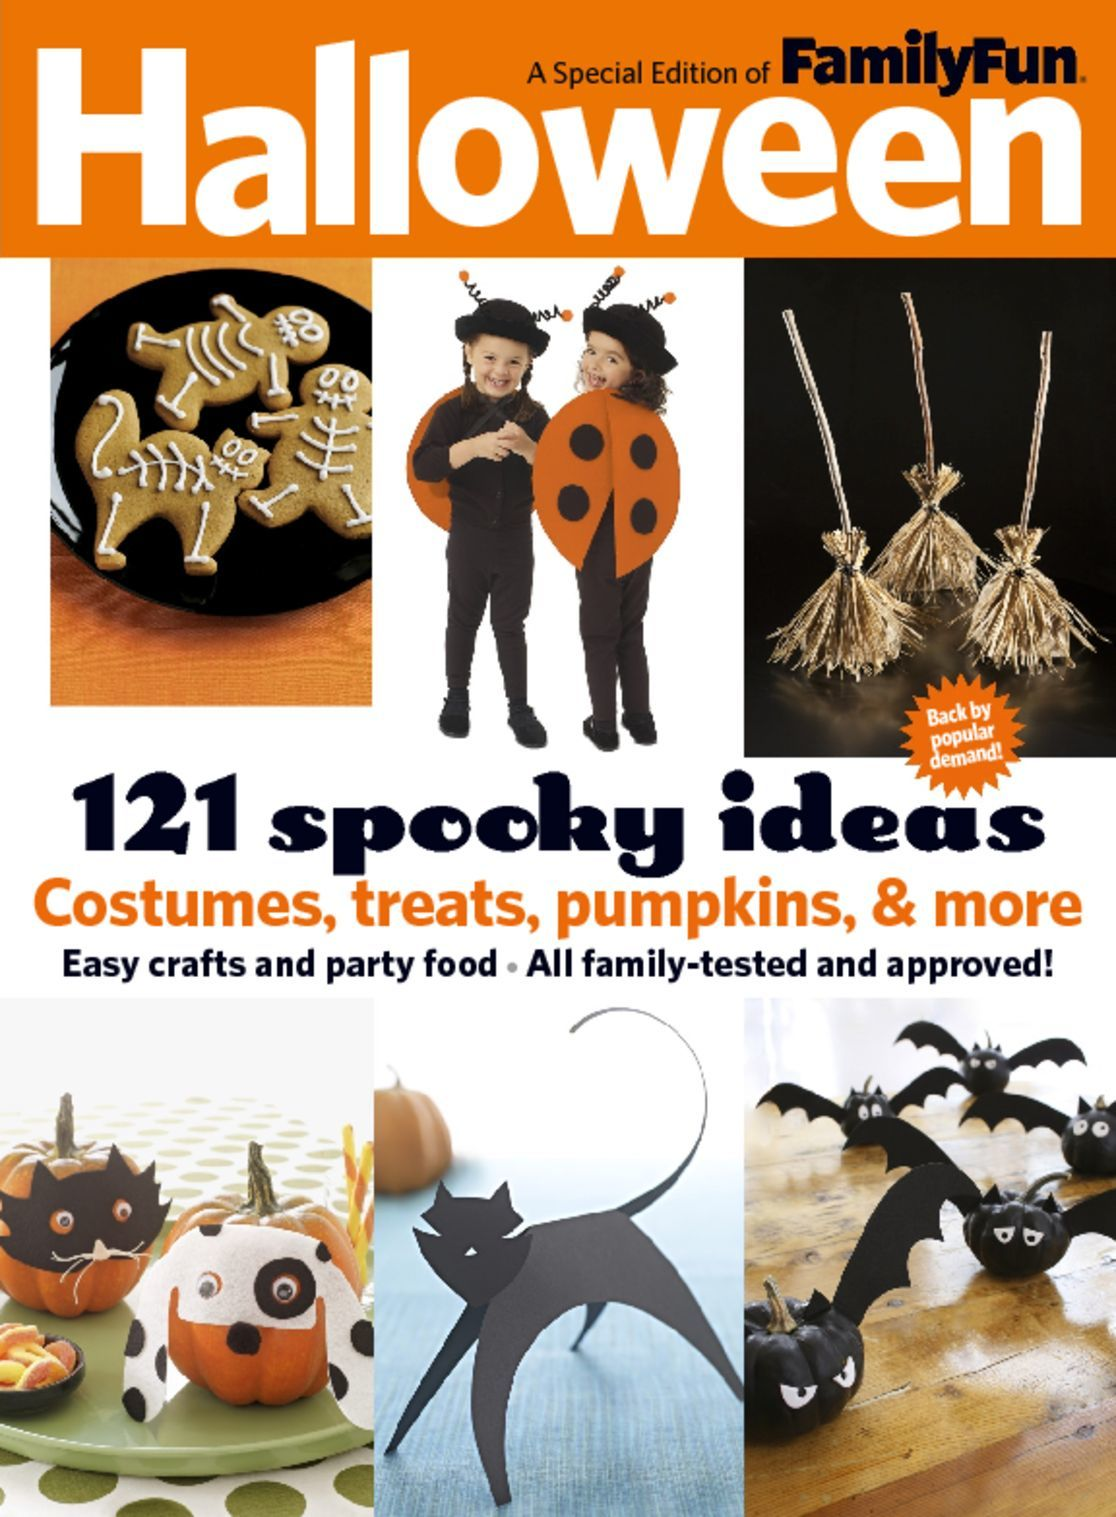 familyfun halloween magazine digital discountmagscom - Family Fun Magazine Halloween Crafts